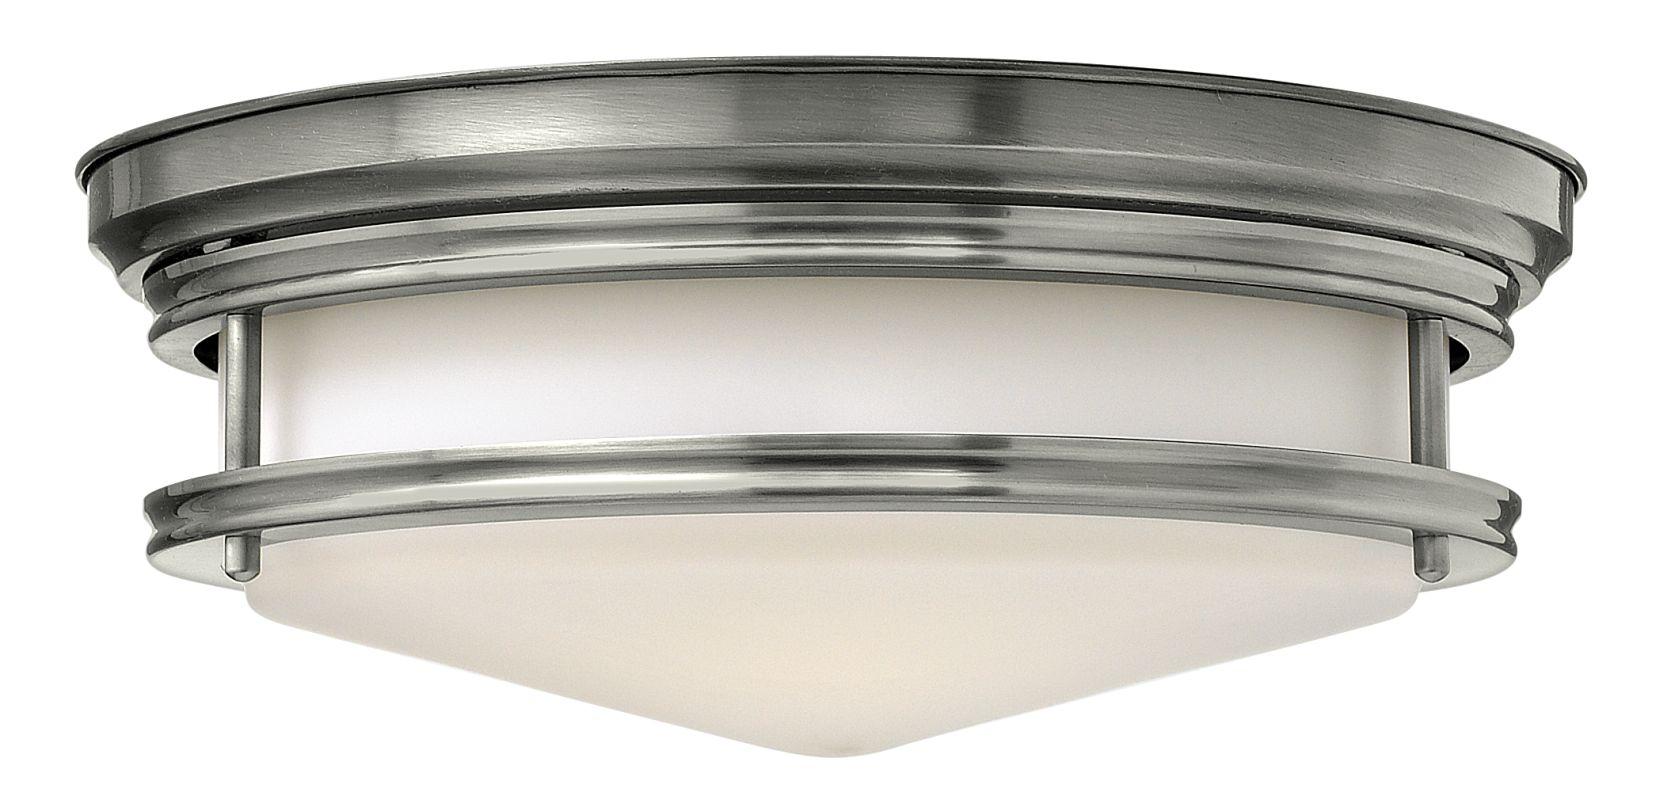 Shop Portfolio 3 Light Vassar Brushed Nickel Bathroom: Hinkley Lighting 3301AN Antique Nickel 3 Light Indoor